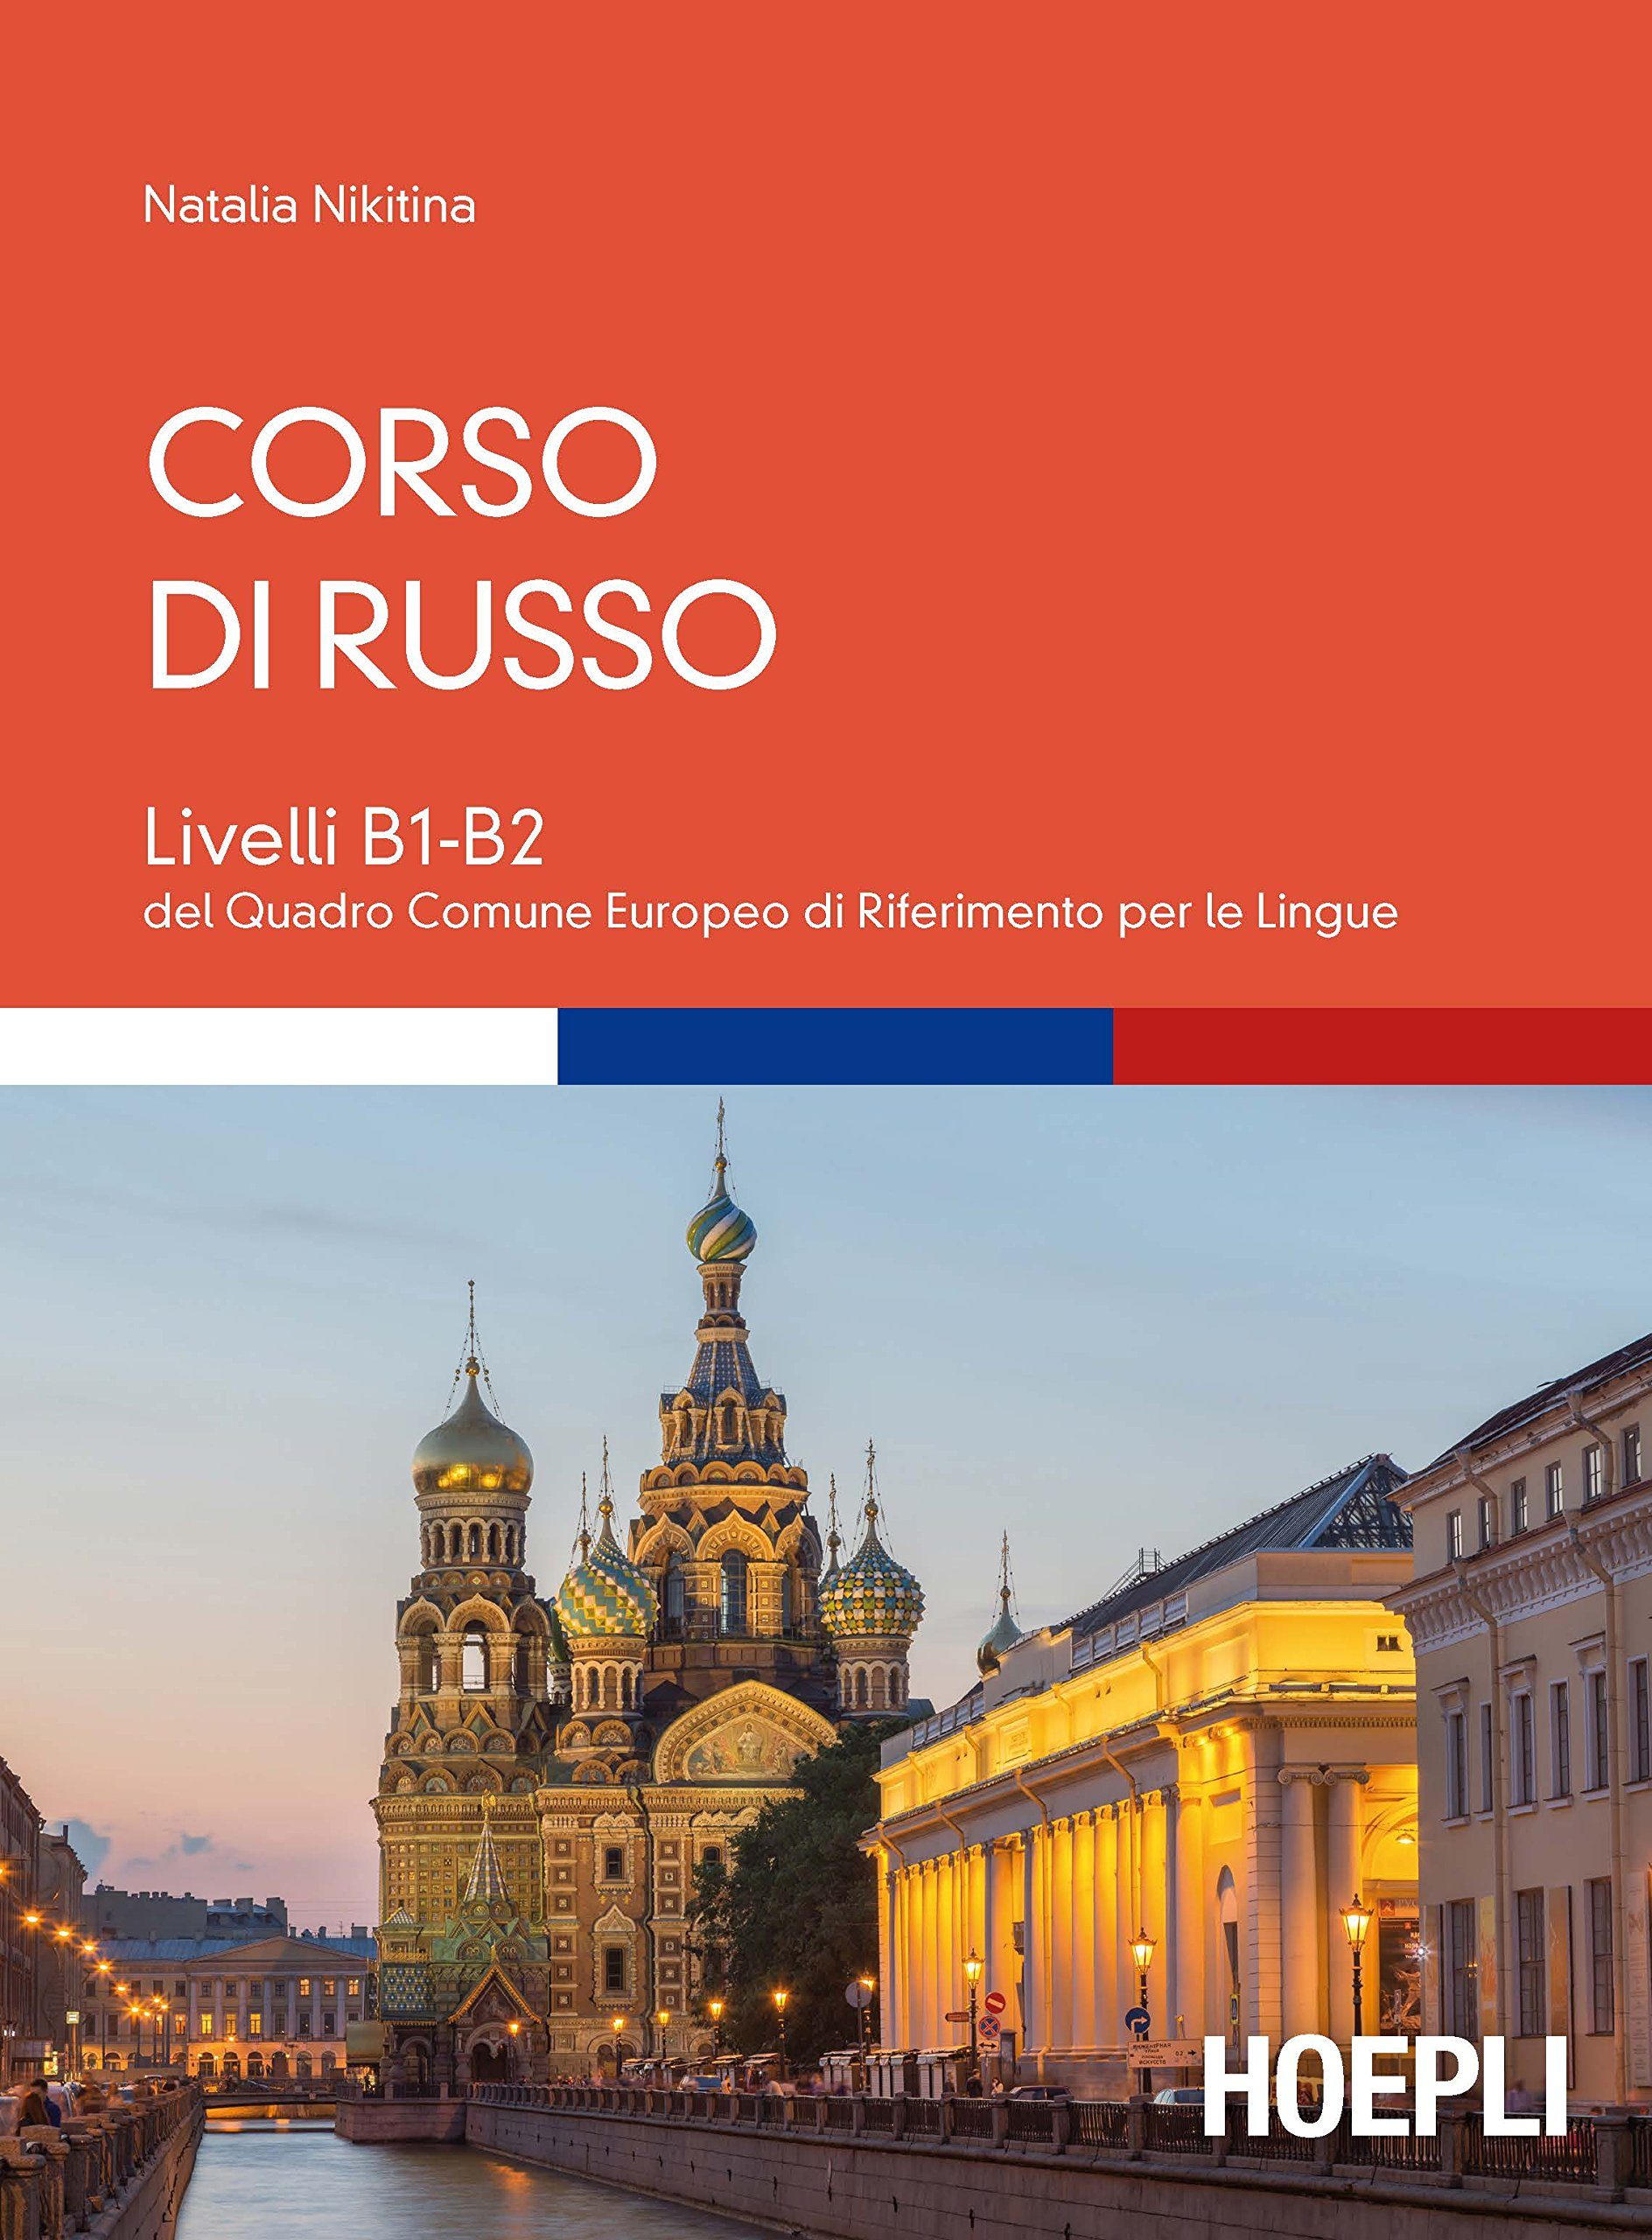 Corso di russo. Livelli B1-B2 Copertina flessibile – 28 ott 2016 Natalia Nikitina Hoepli 882037692X ALTRE LINGUE